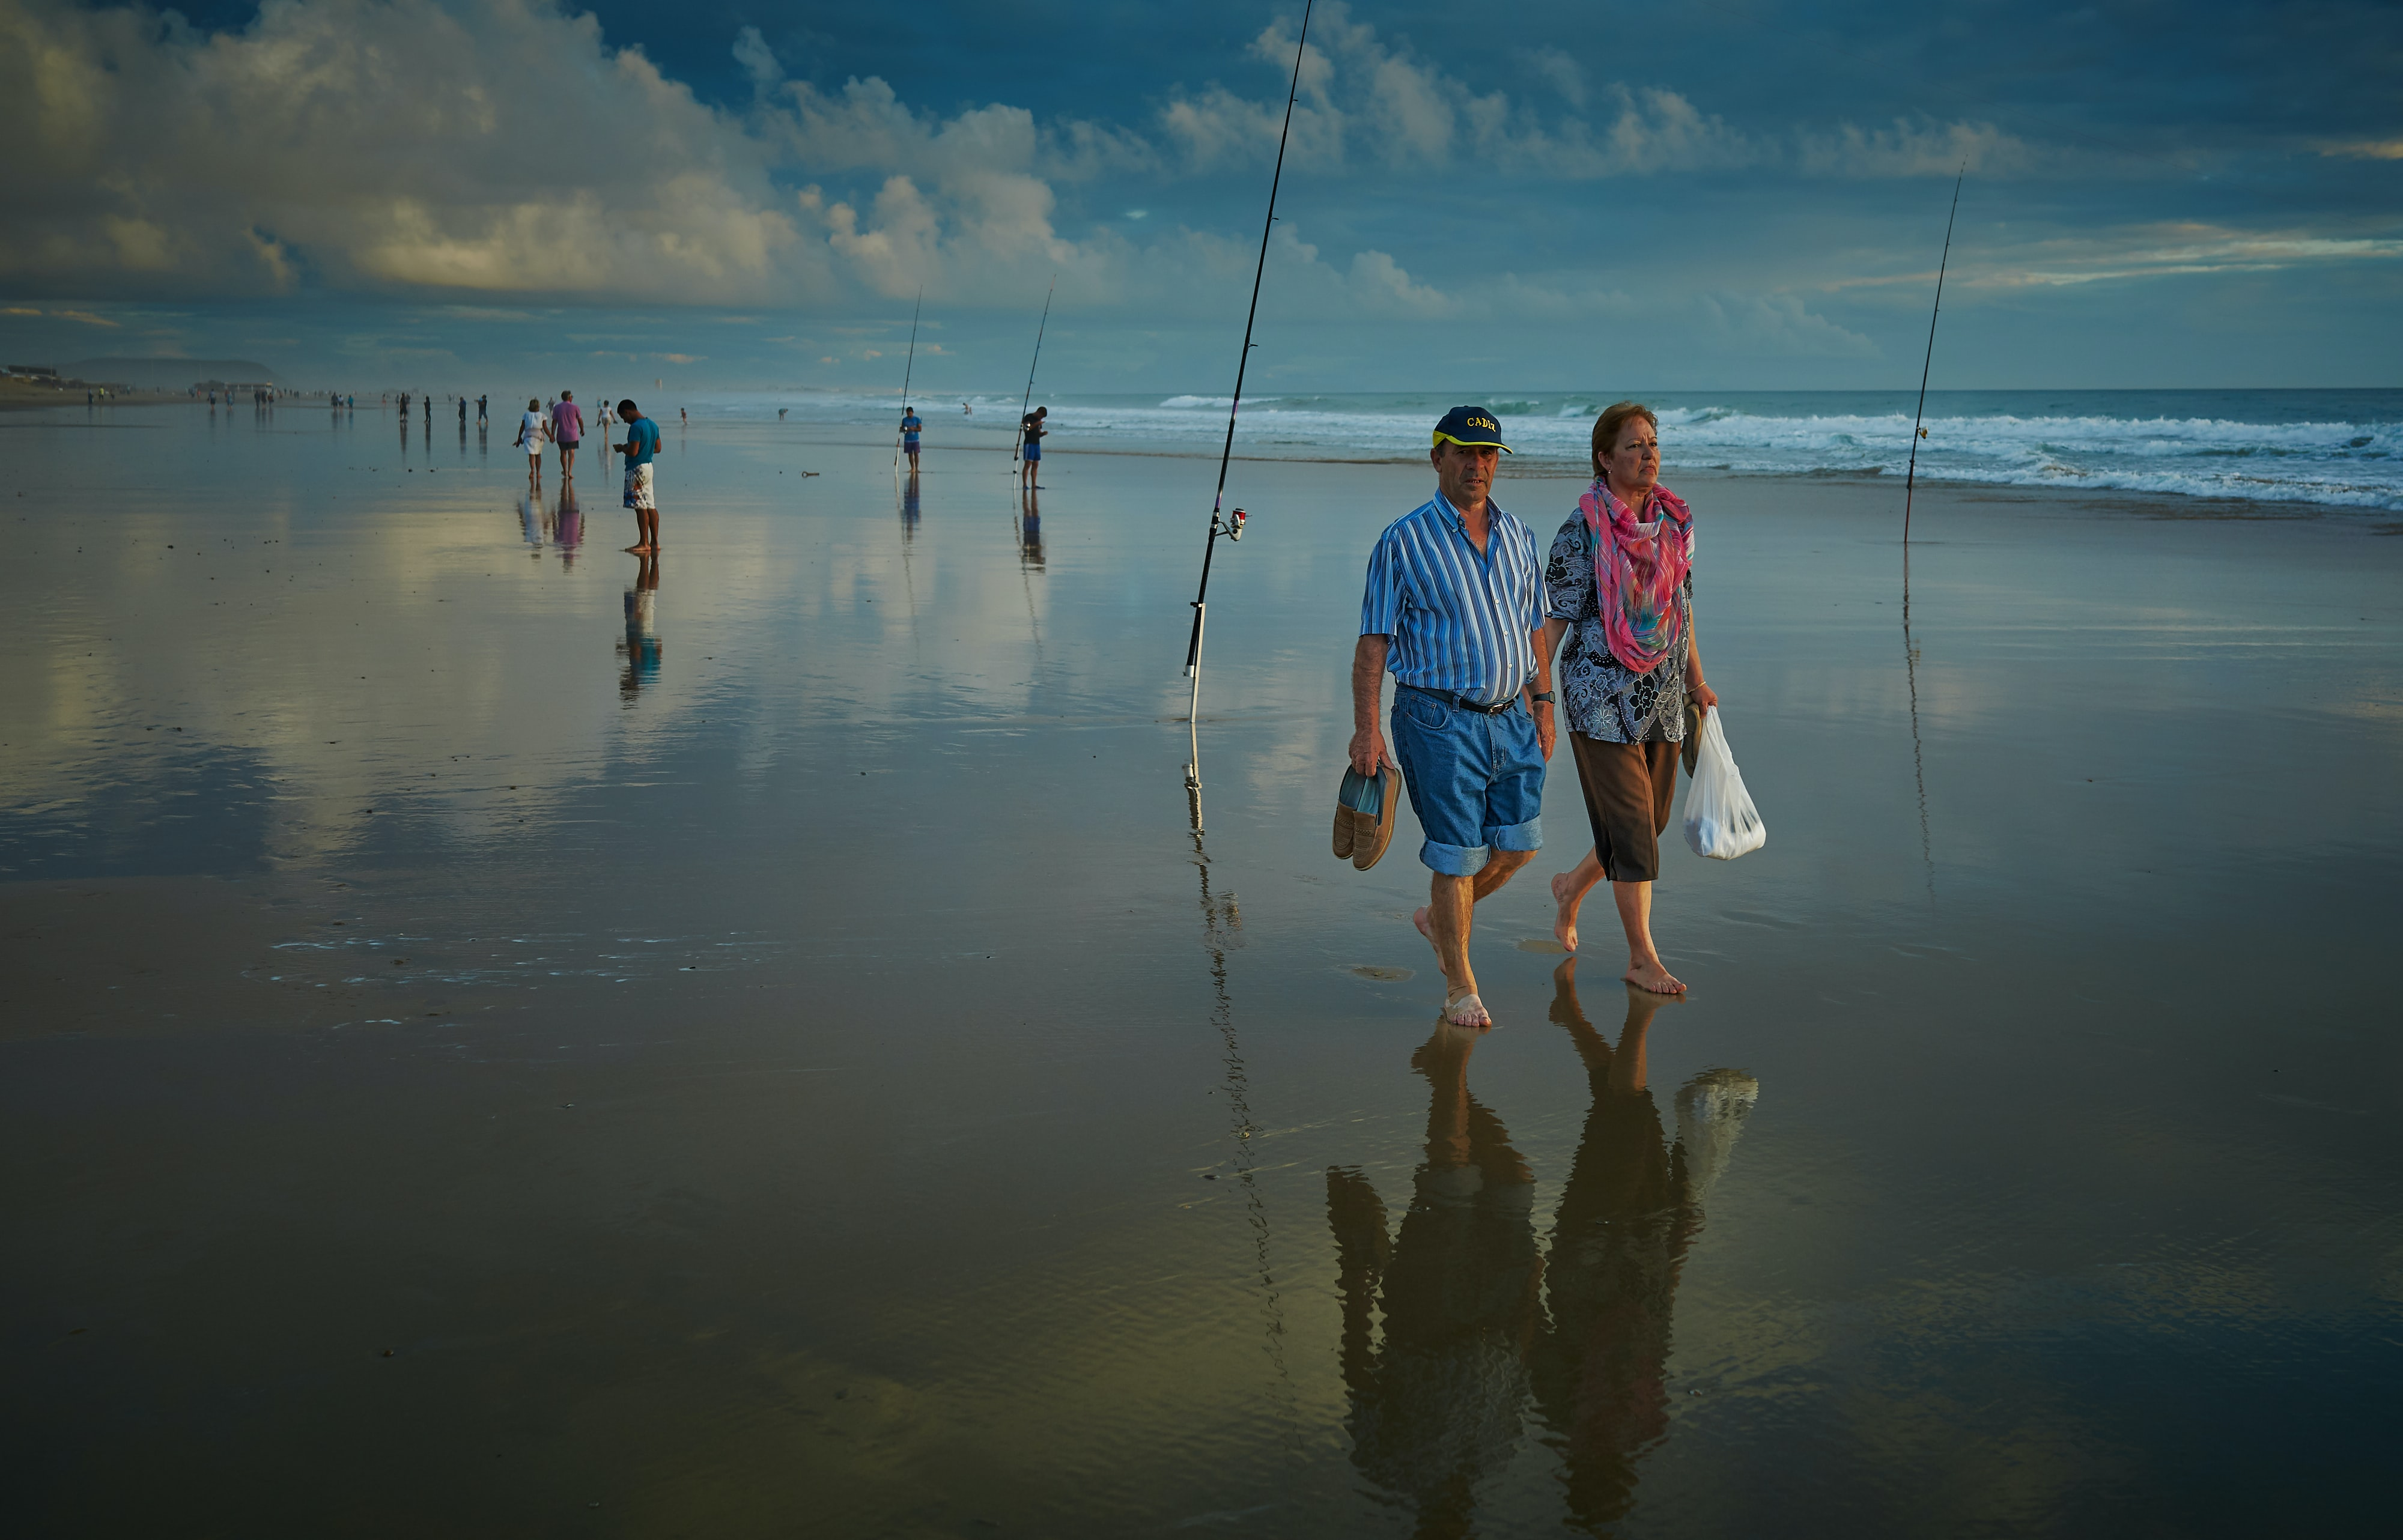 two man and woman walking on seashore